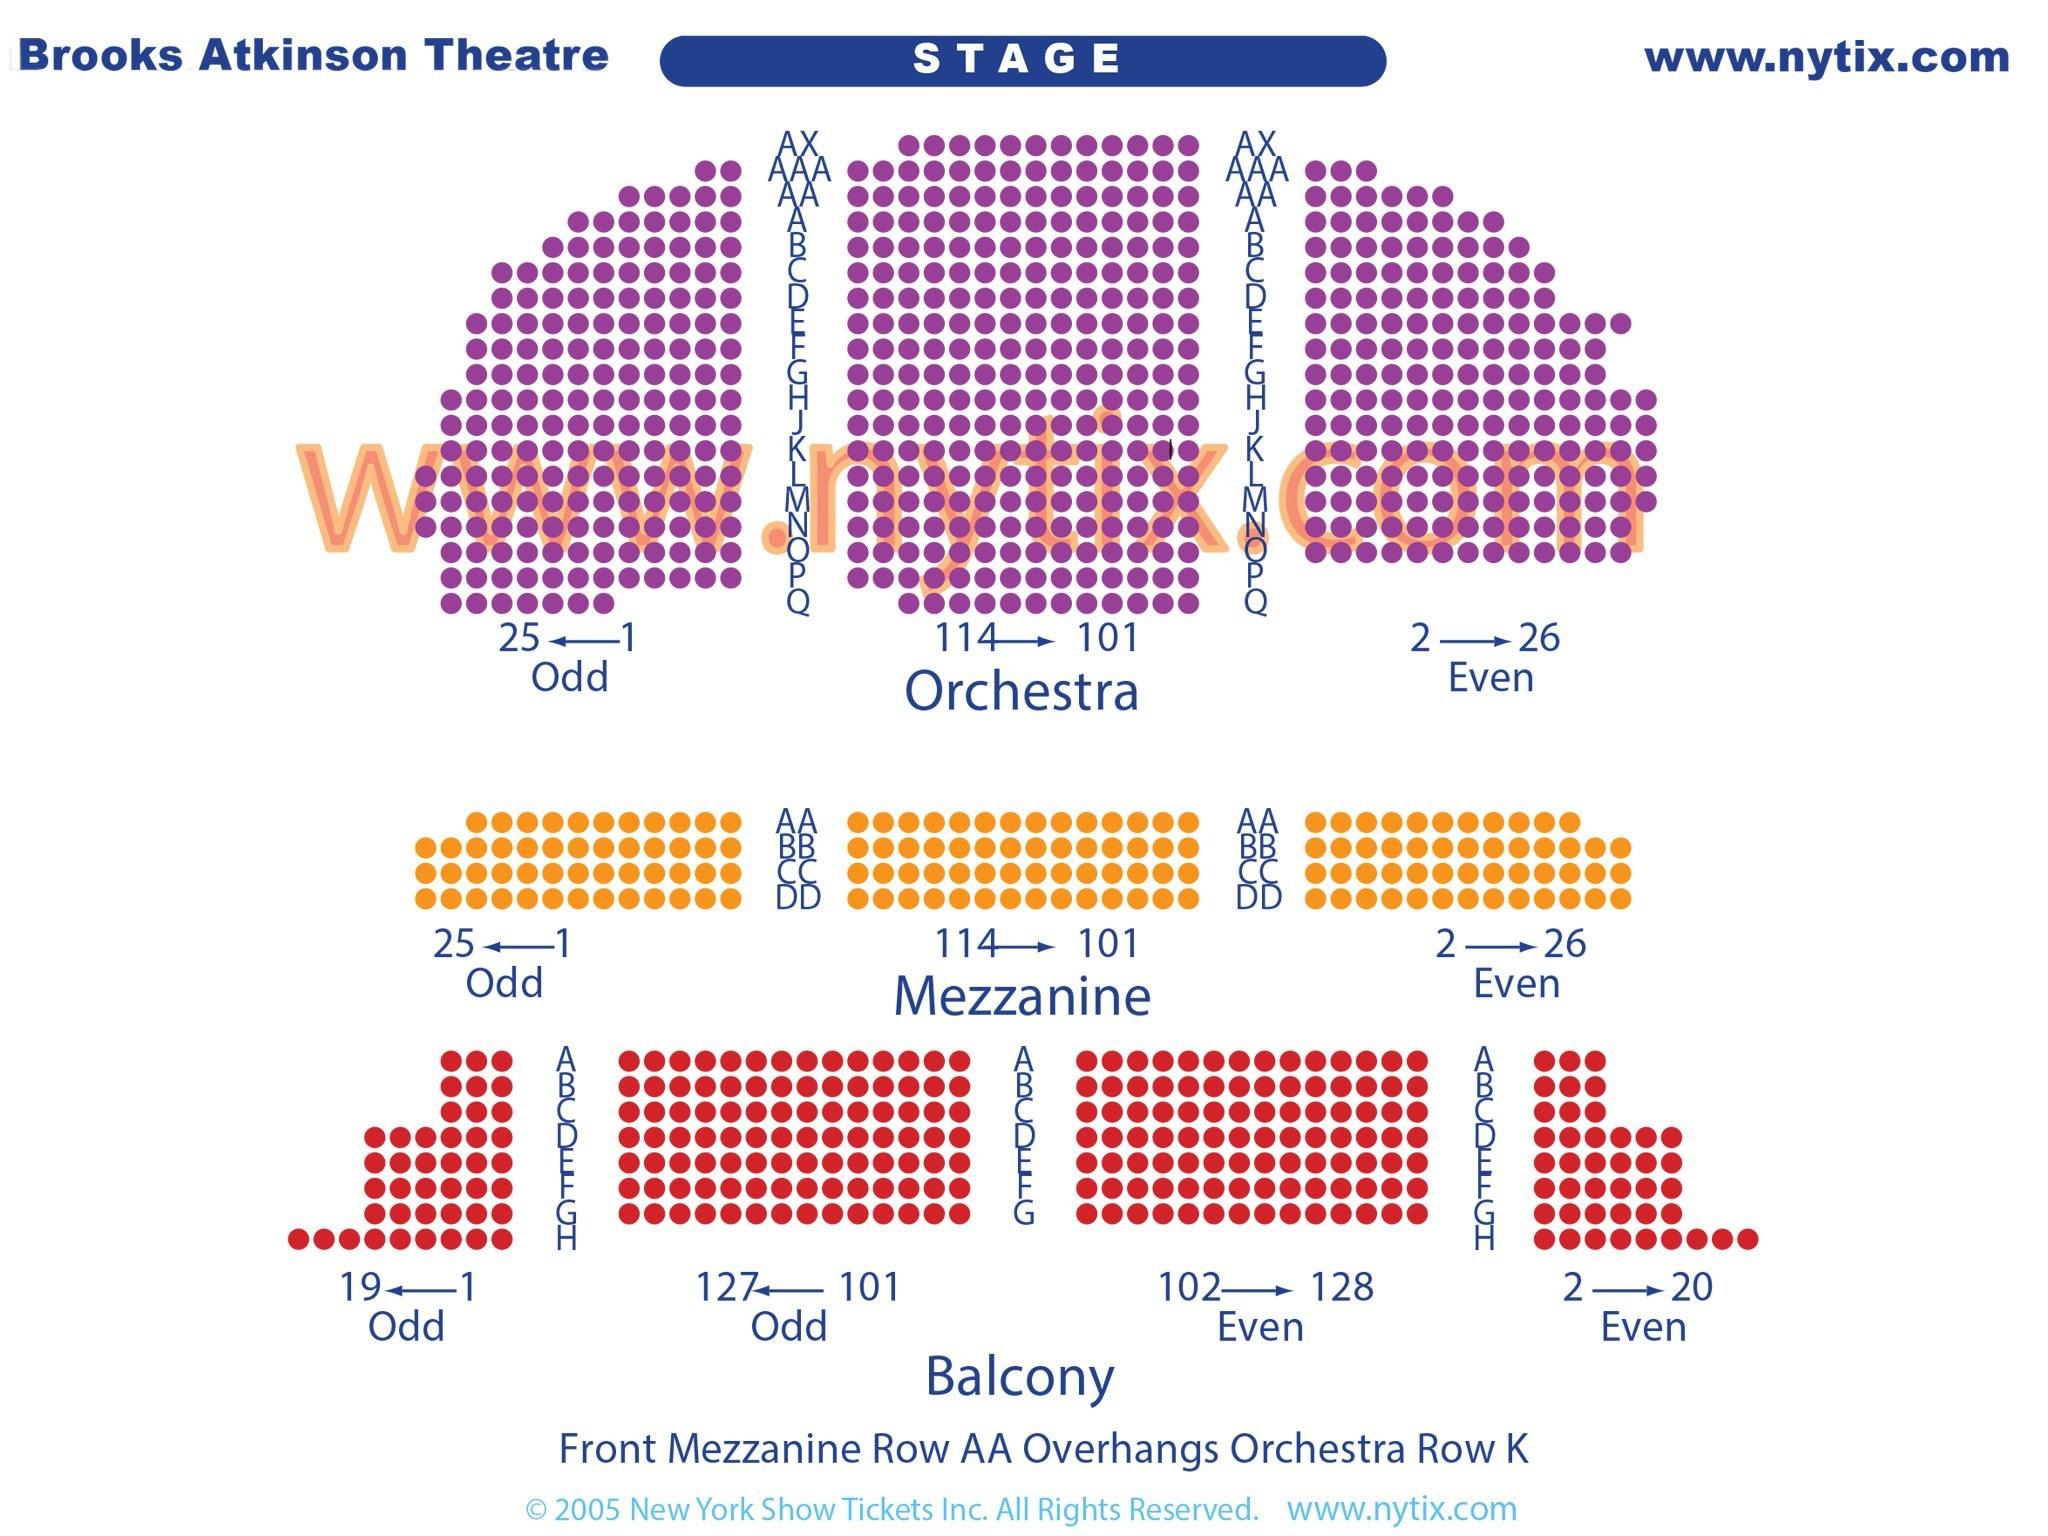 Brooks Atkinson Theatre Seating Chart